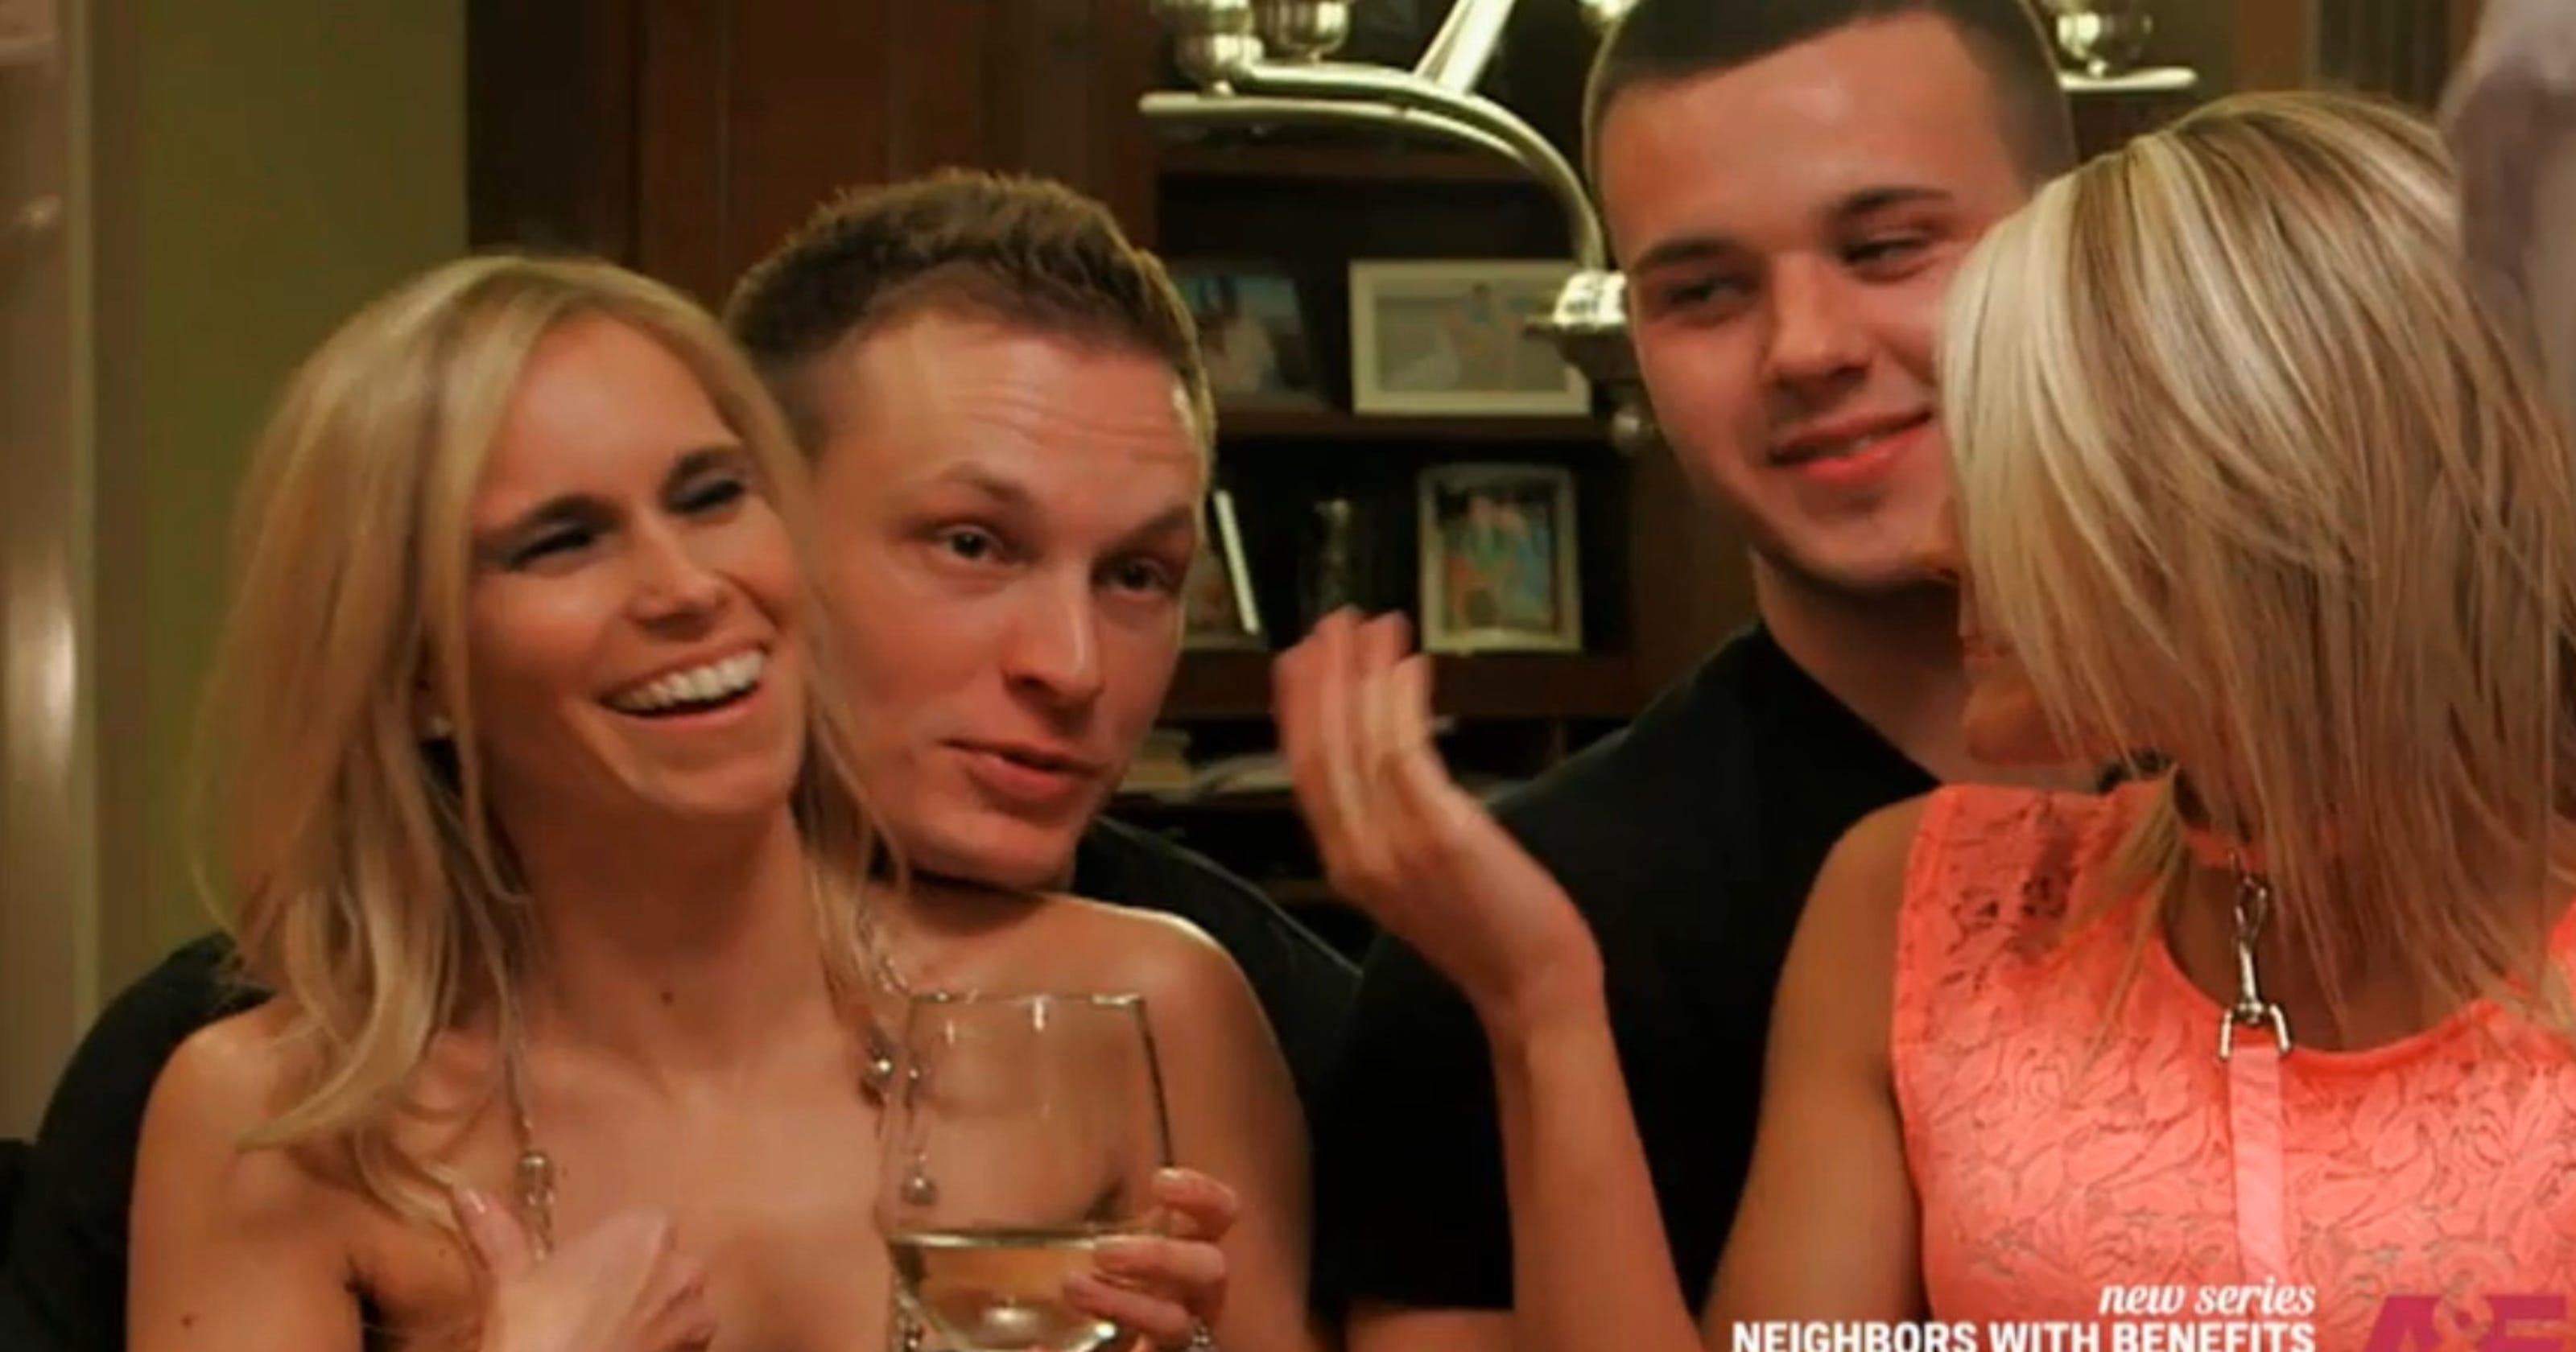 Reality TV series documents Warren County swingers